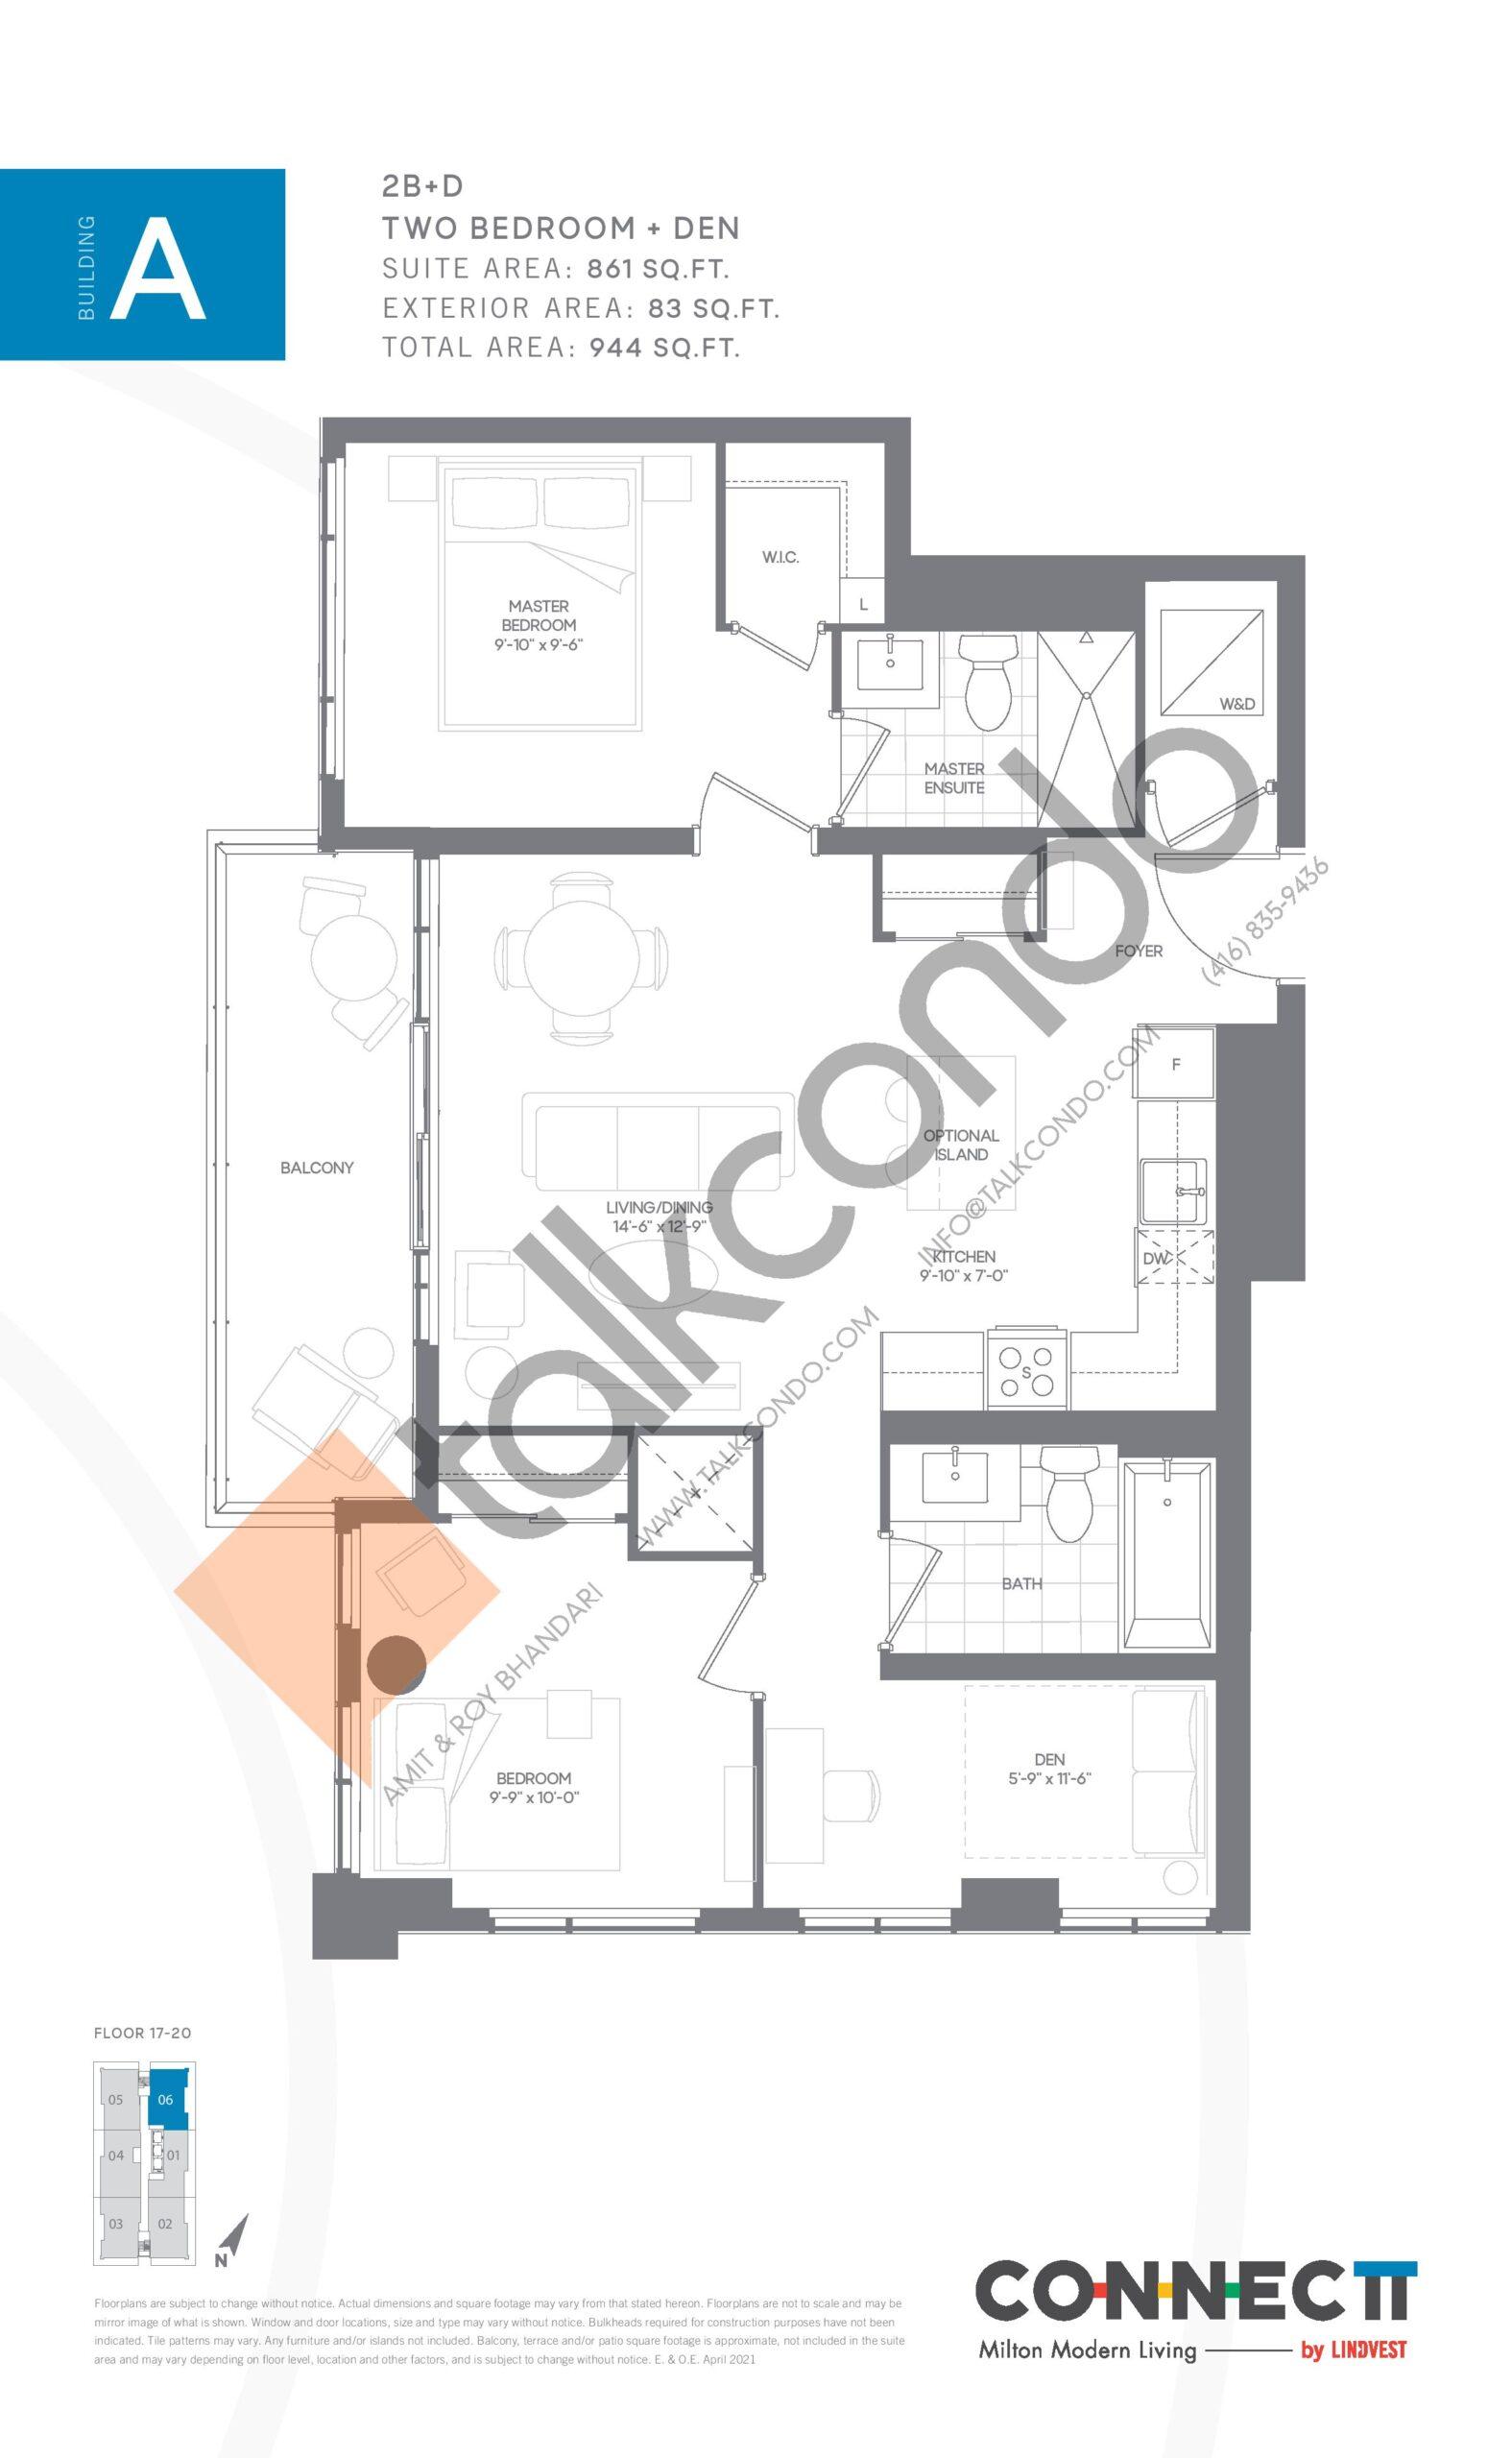 2B+D Floor Plan at Connectt Urban Community Condos - 861 sq.ft